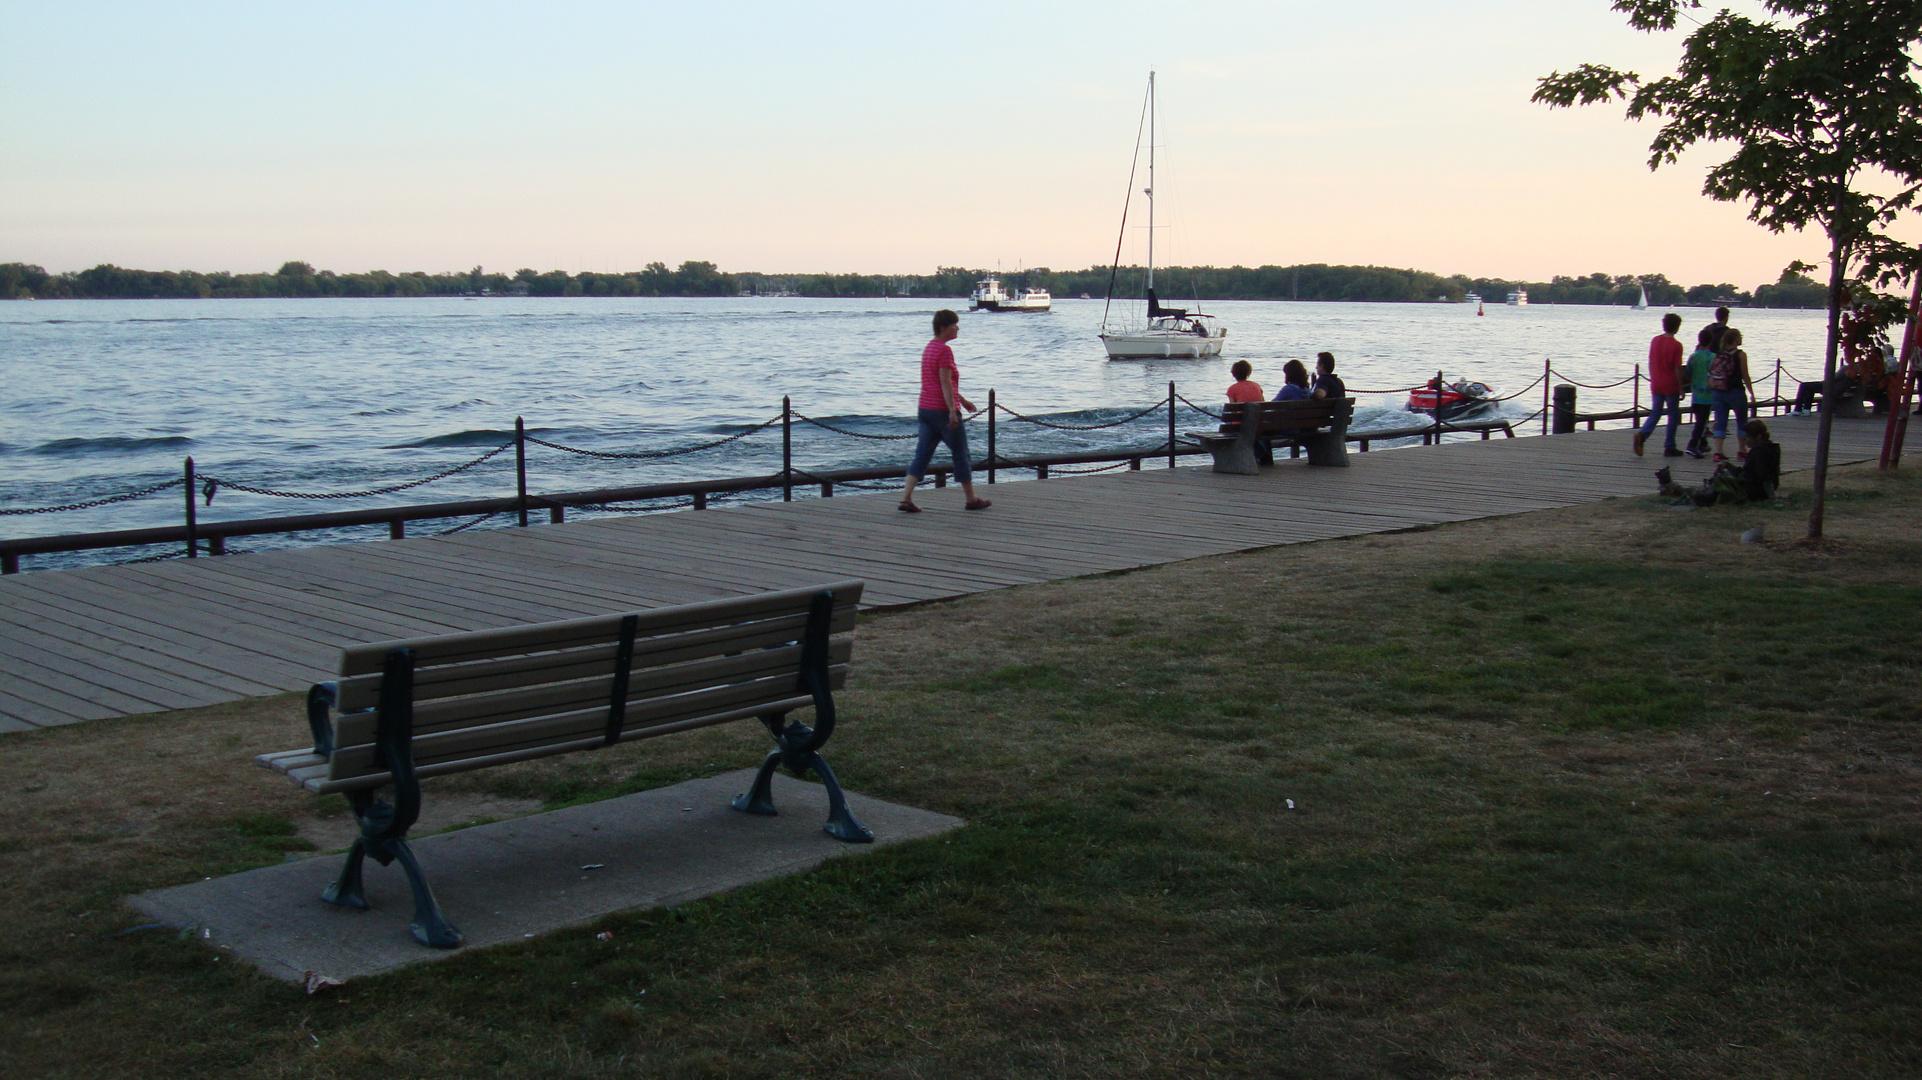 Harbour Square Park East-Toronto,Ontario 2013